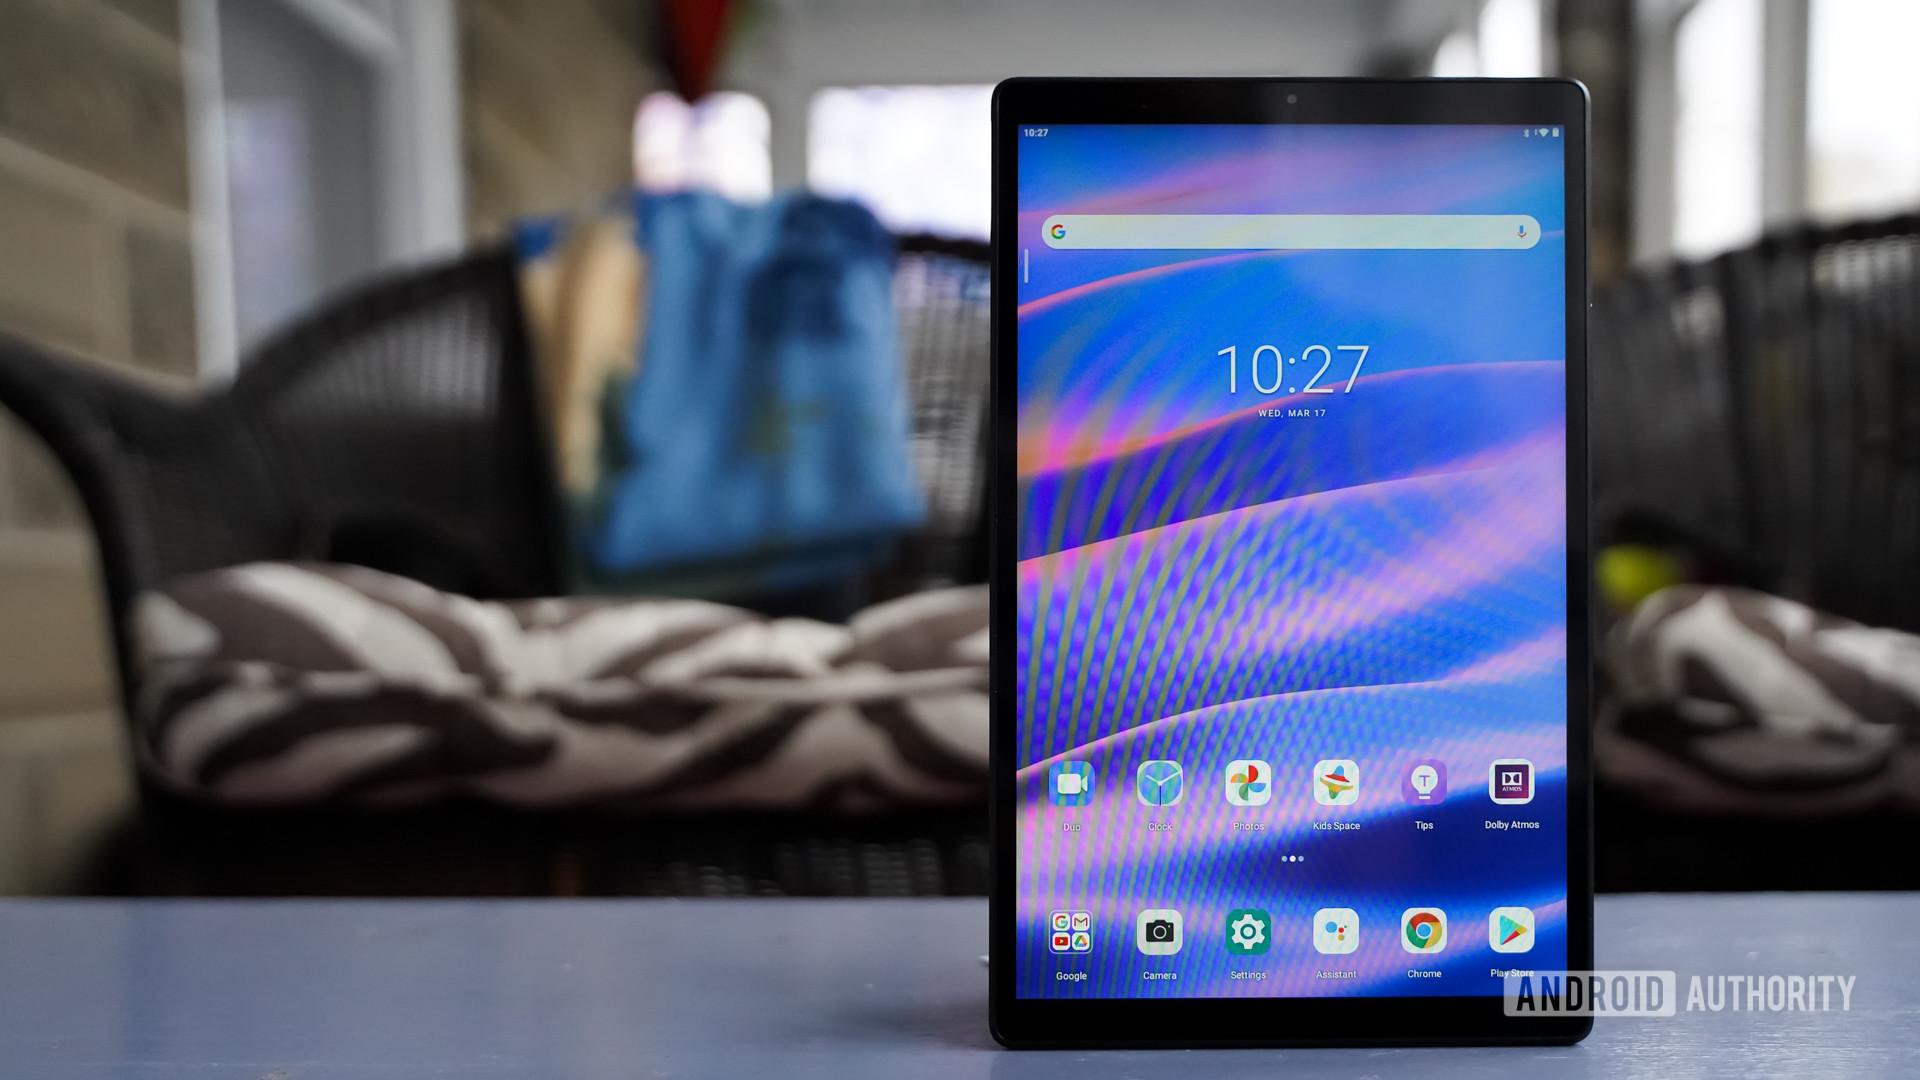 Lenovo Smart Tab M10 HD upright display